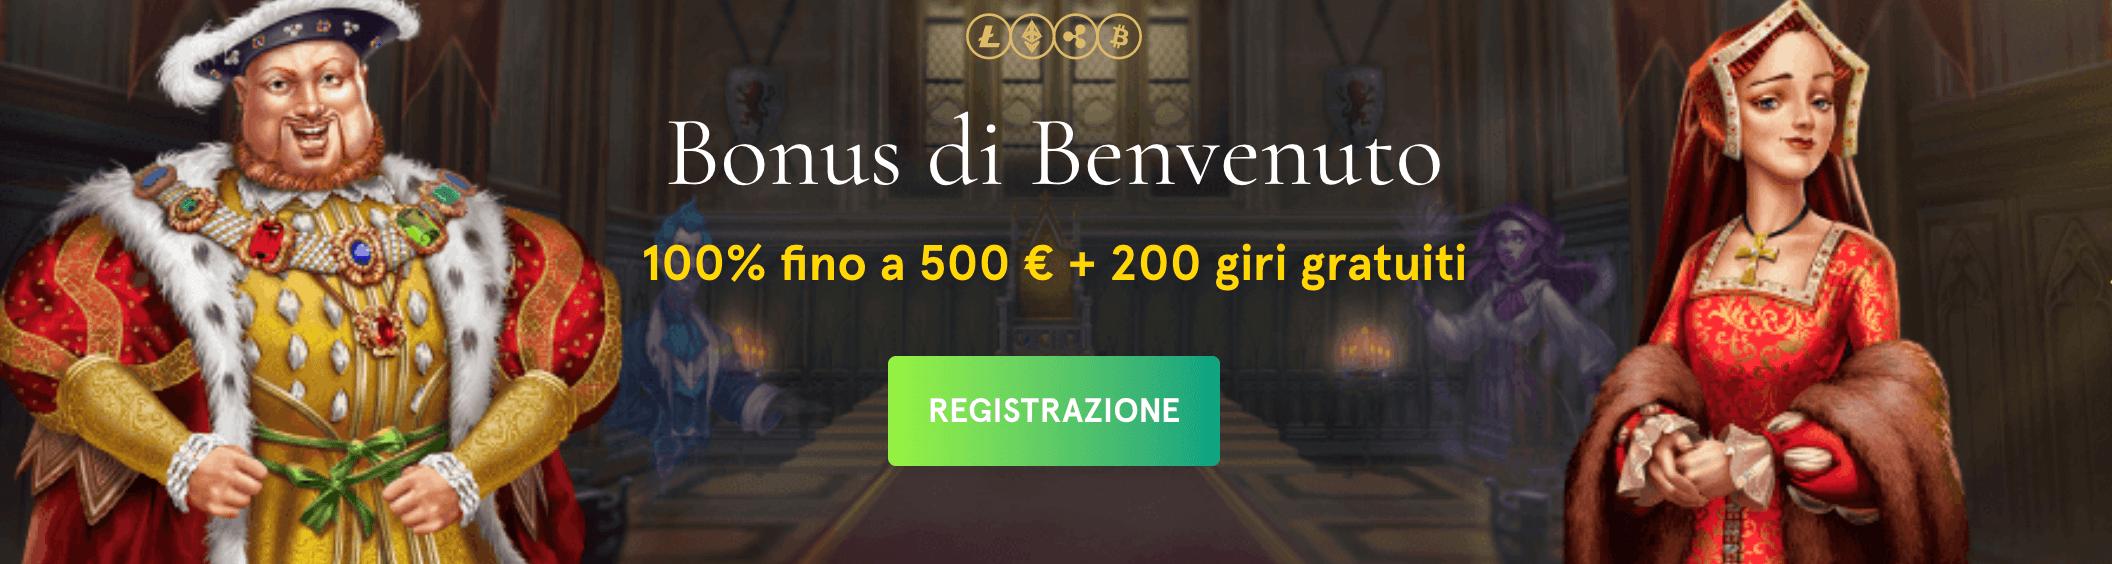 Casinia Casino Bonus Benvenuto